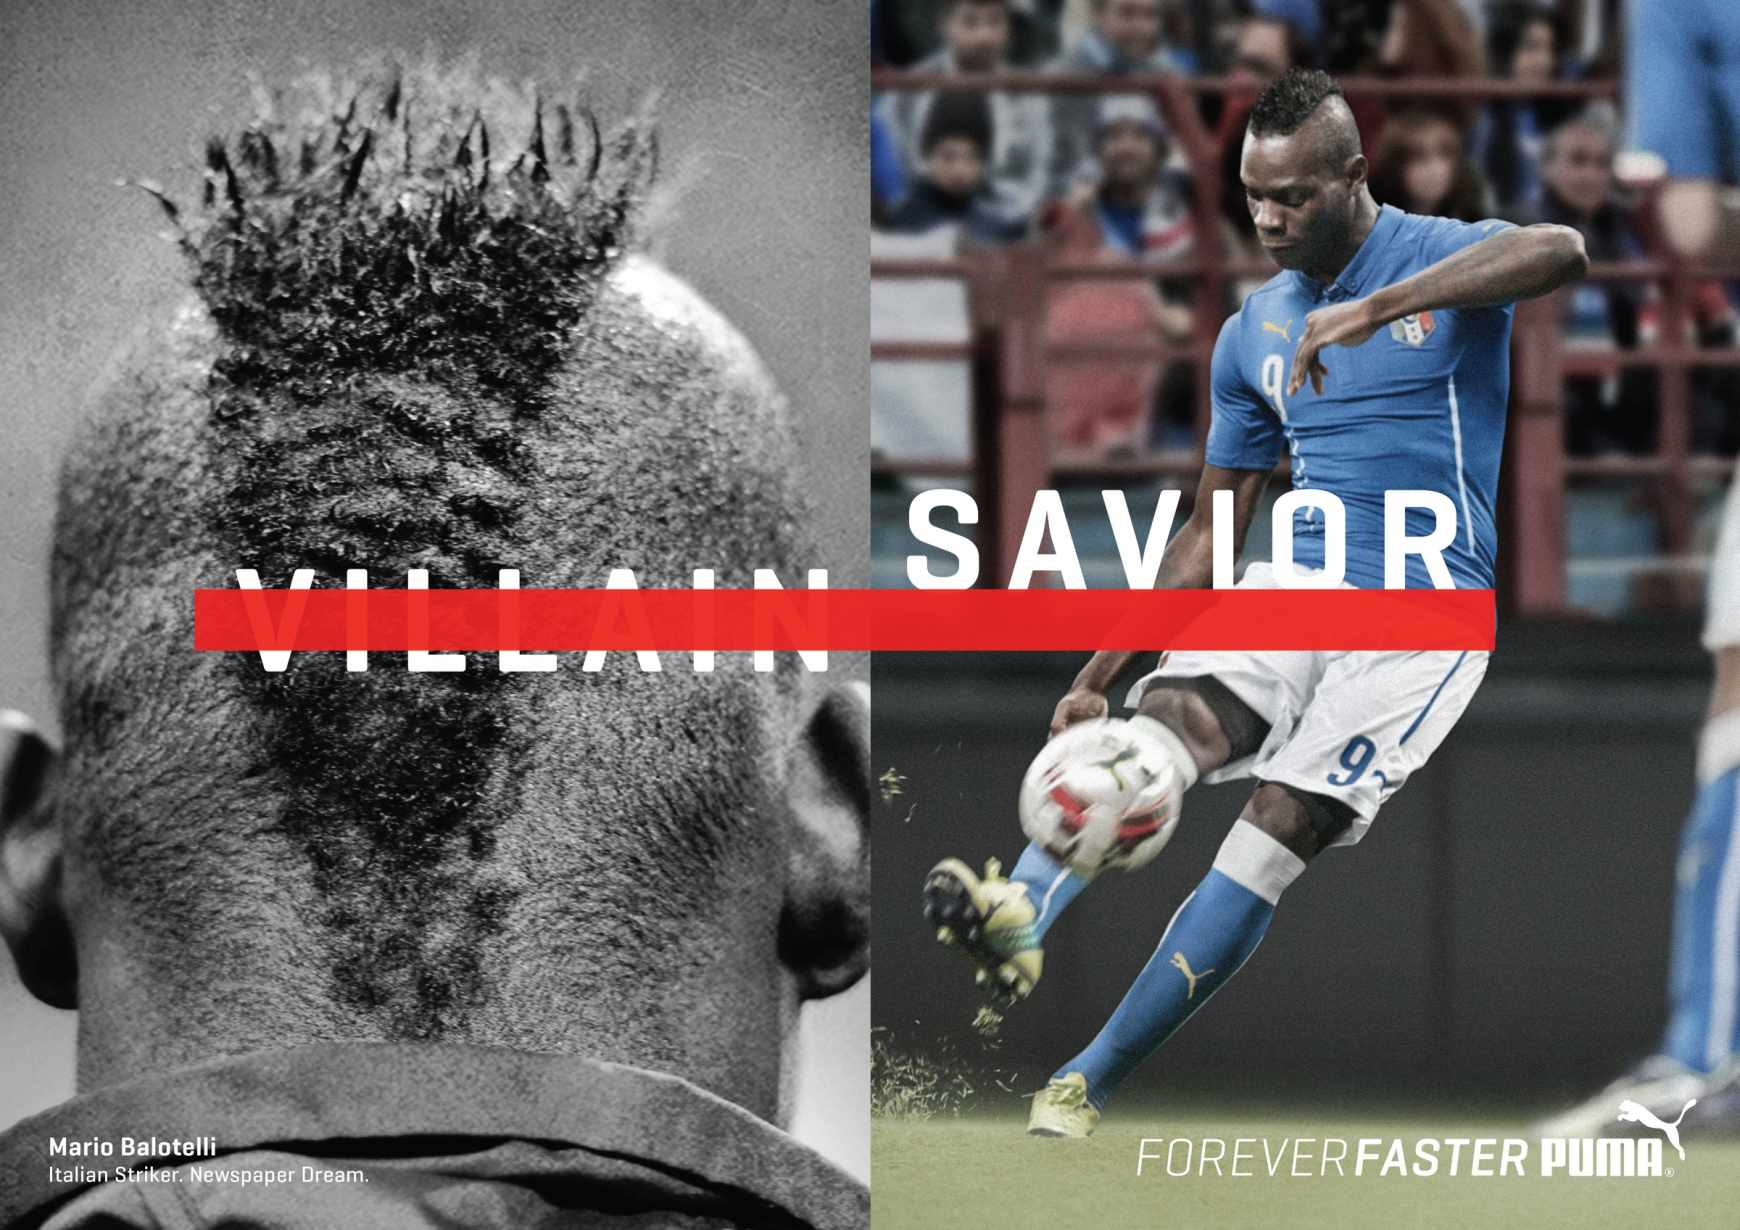 balotelli_-_villan_savior_aotw_0